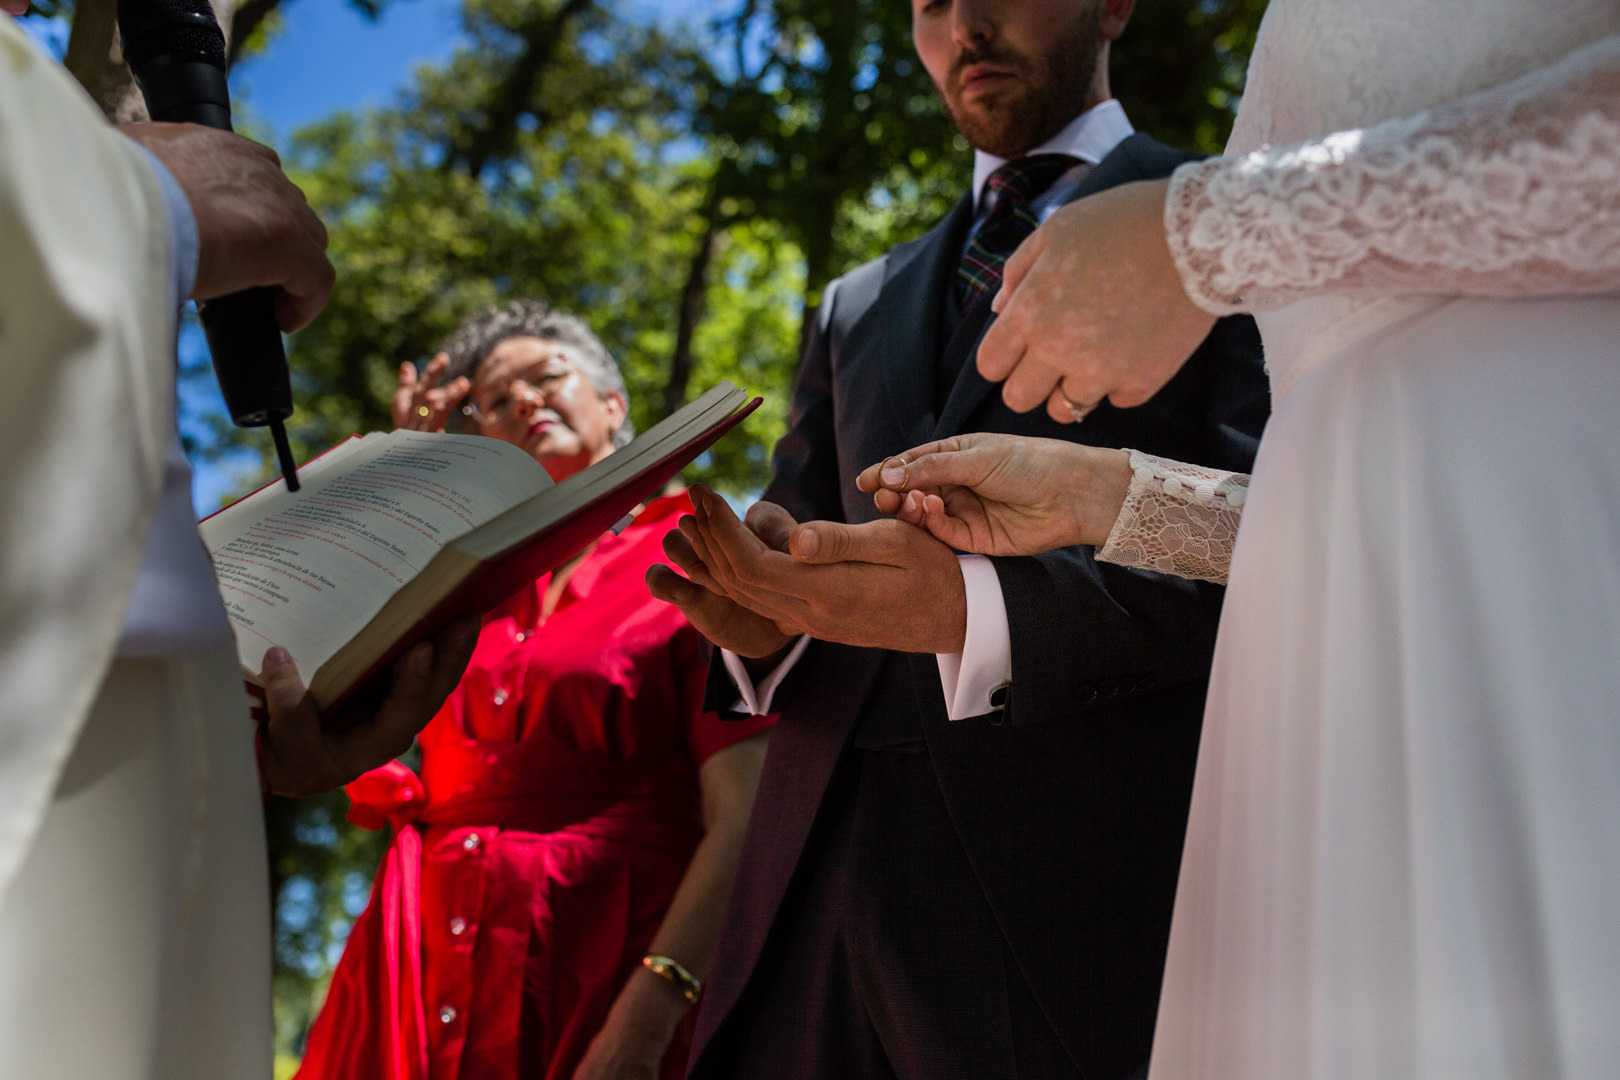 Boda-Lucia-Javi-Lugo-Rafael-Torres-fotografo-bodas-sevilla-madrid-barcelona-wedding-photographer--23.jpg